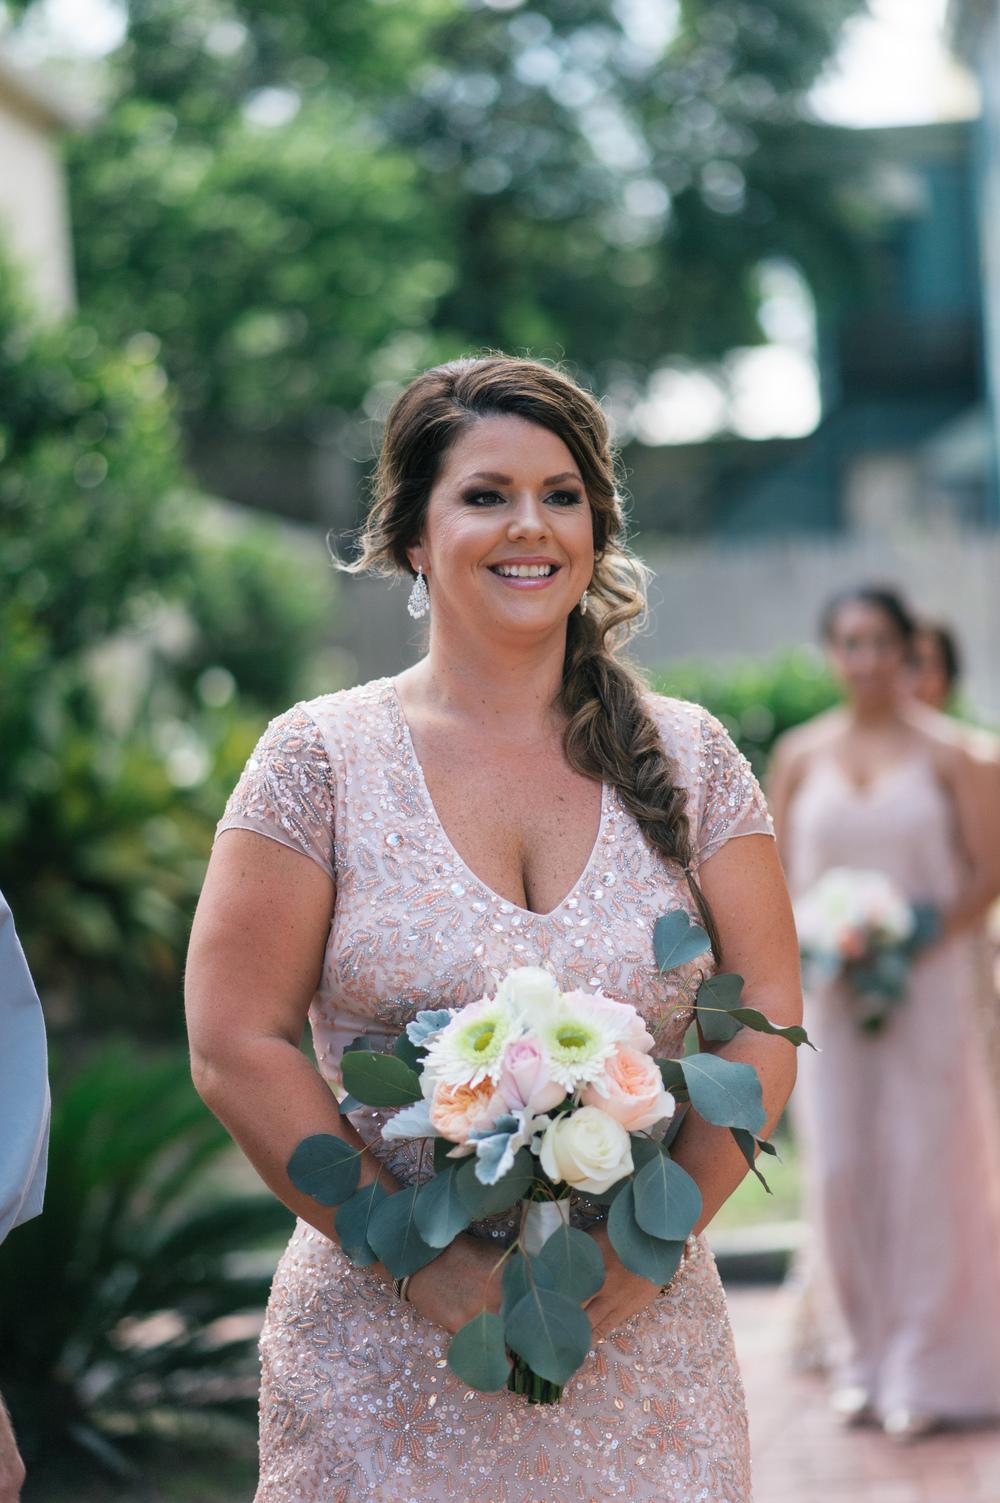 kacey-and-niall-June-4-savanna-georgia-wedding-m-newsom-photography- (270 of 961).jpg